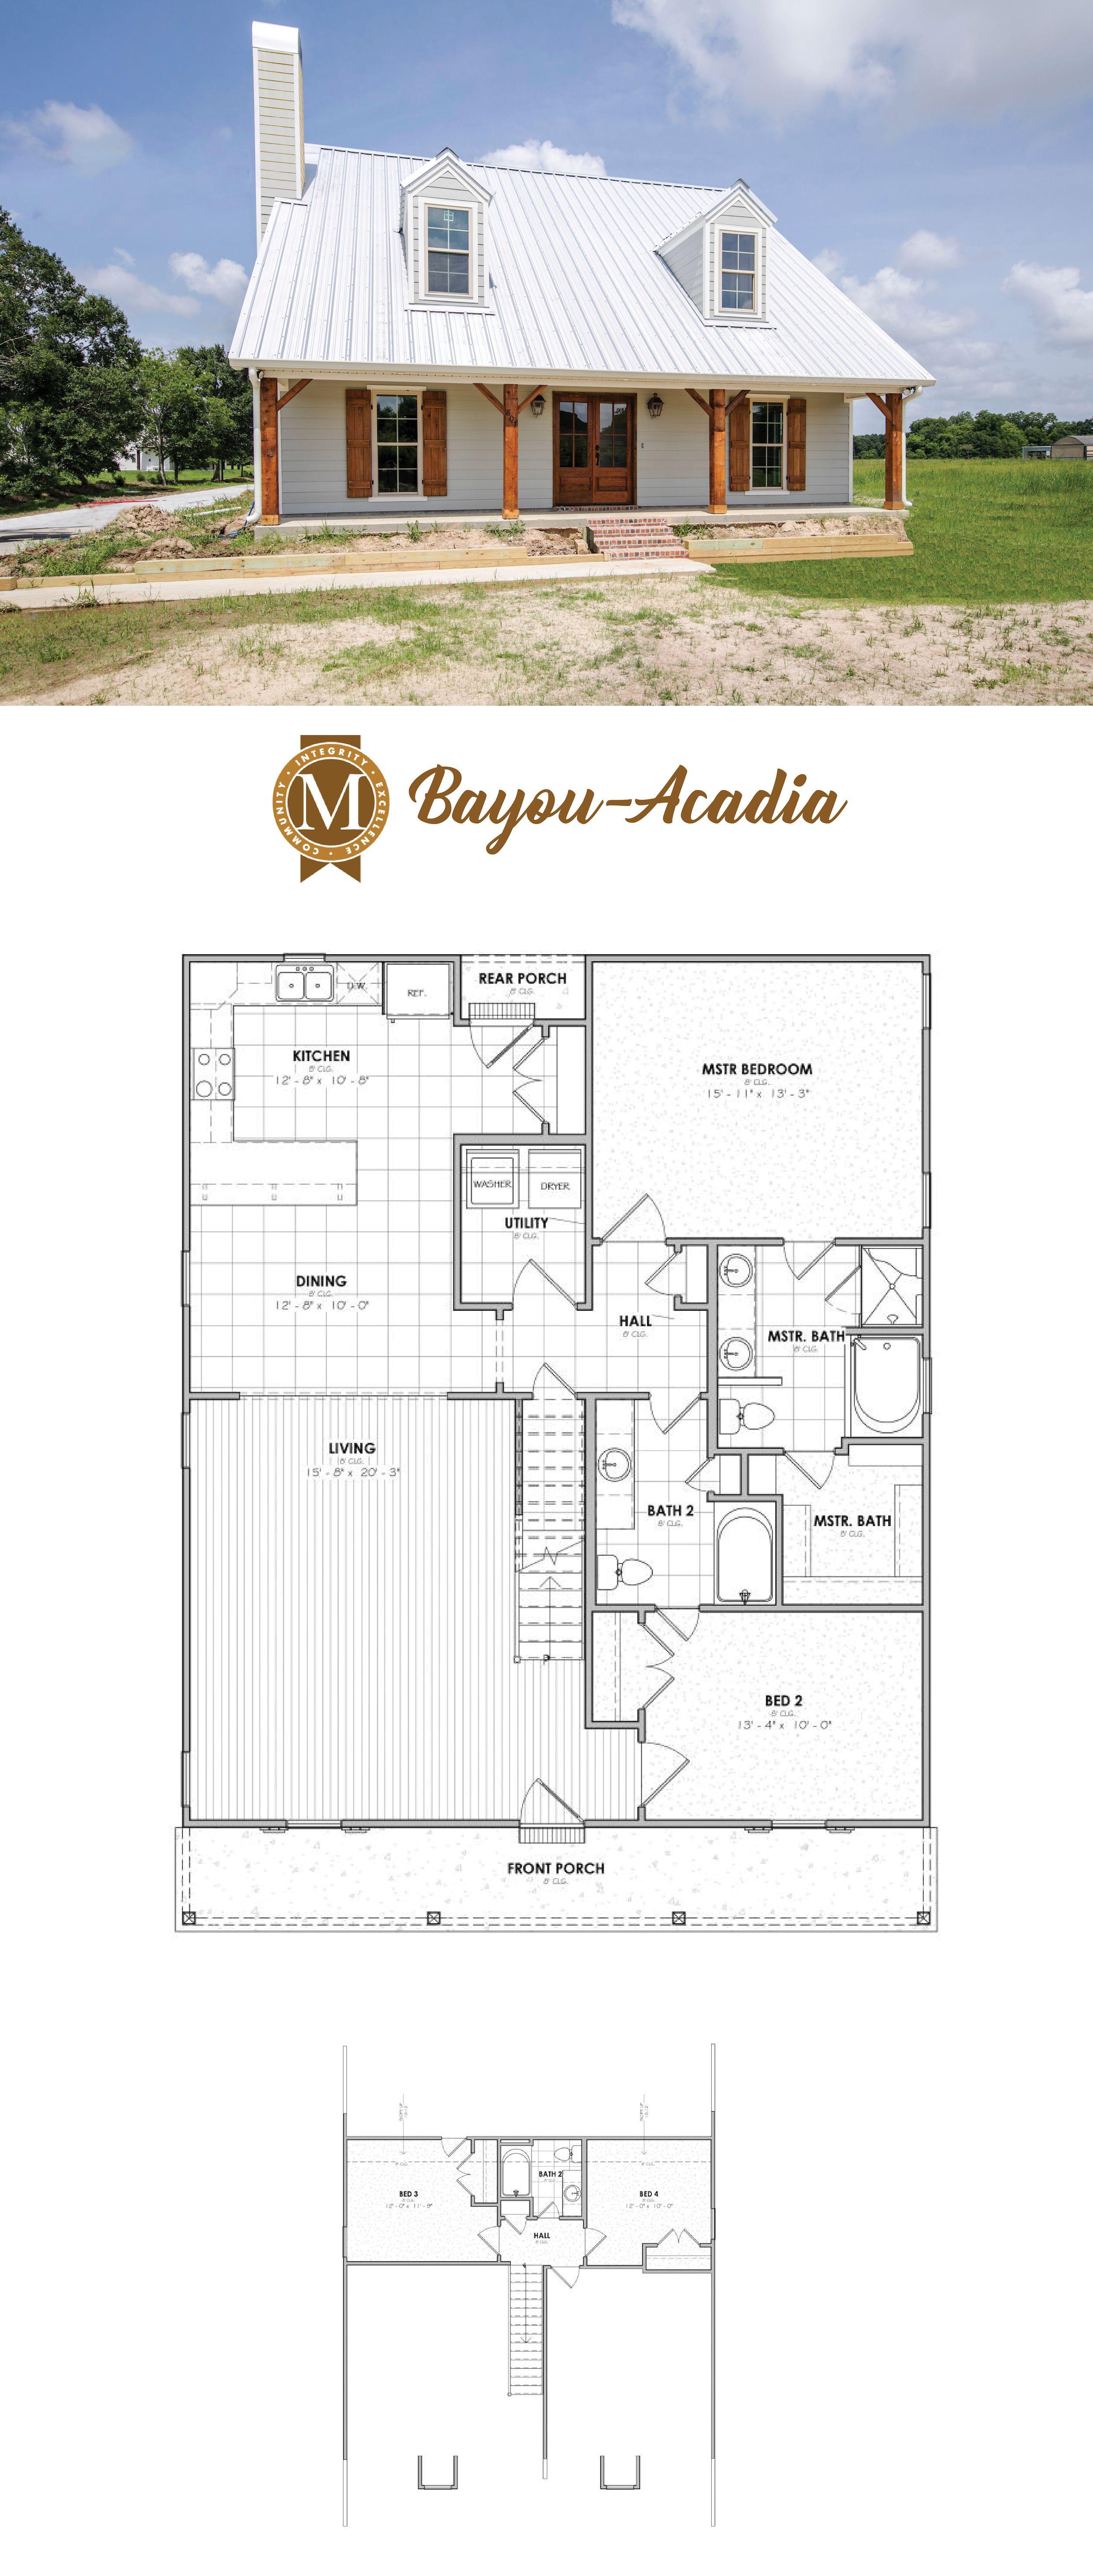 Lafayette Region Plan Acadia Bayou Living Square Feet 2024 Bedrooms 3 Bathrooms 3 Lafayette Lake Cha House Plans Farmhouse Barn House Plans House Plans